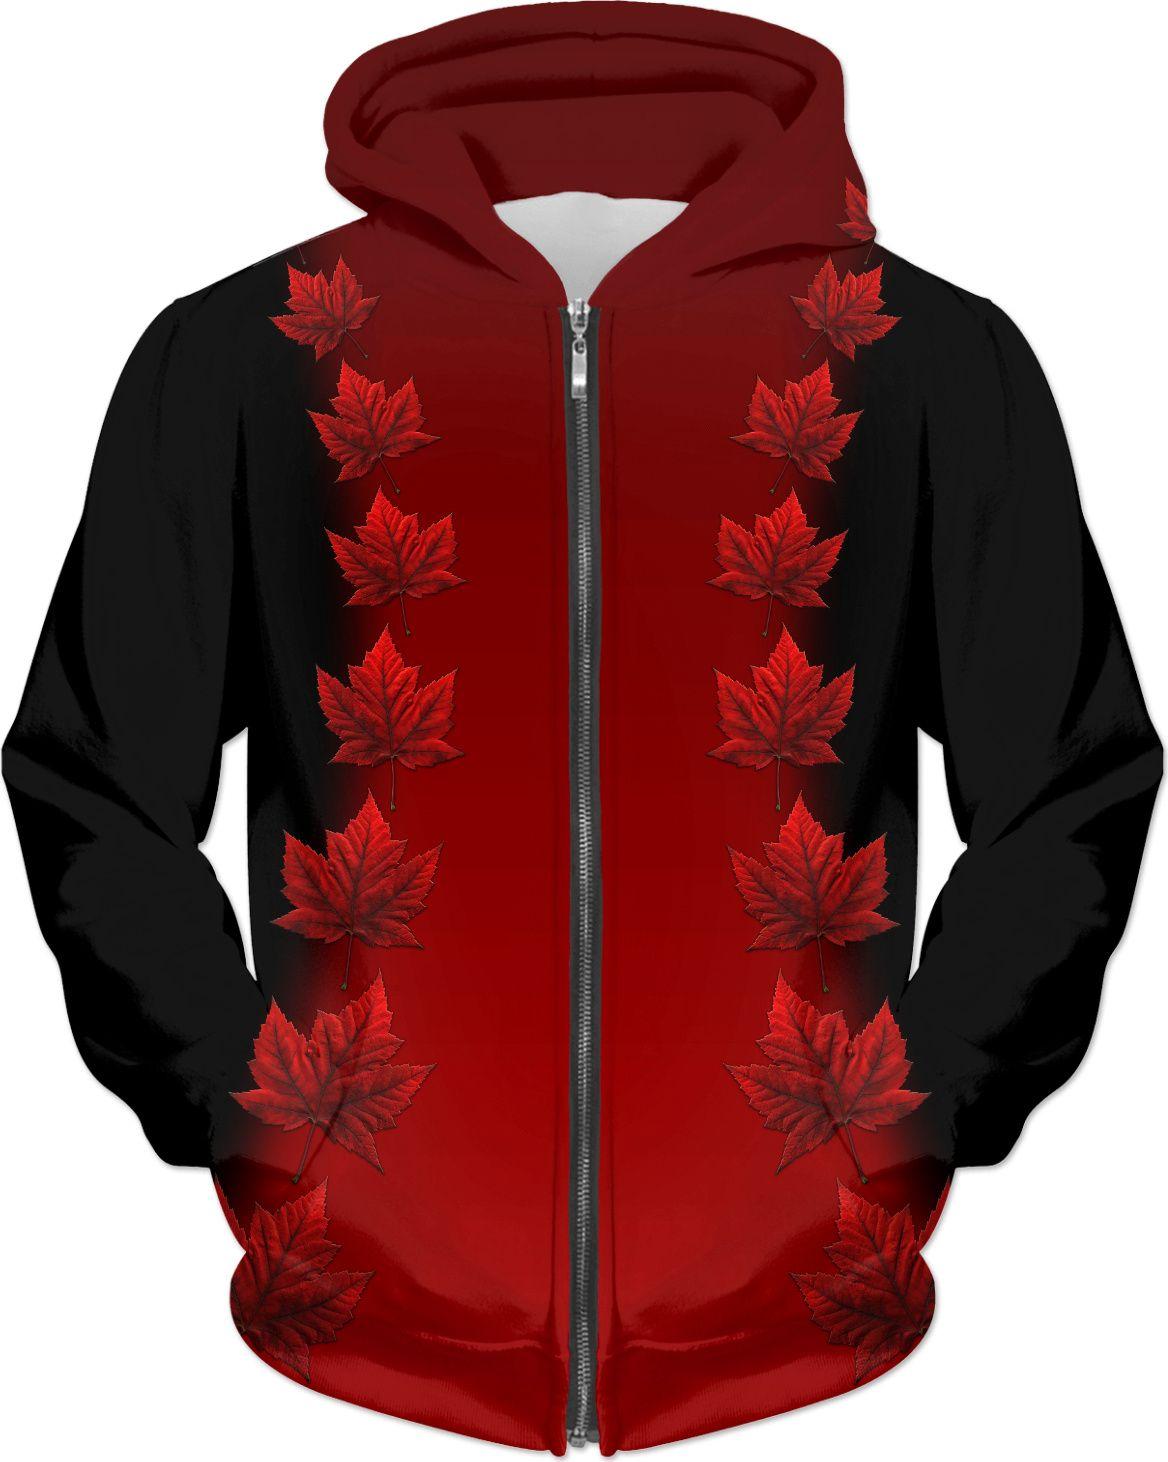 ce54415617 Canada Hoodie Canada Maple Leaf Hoodies Stylish Souvenir Hoodie Jacket  Canadian Maple Leaf Hoodies Canada T-Shirts, Dresses, Pants Socks and Canada  Flag ...